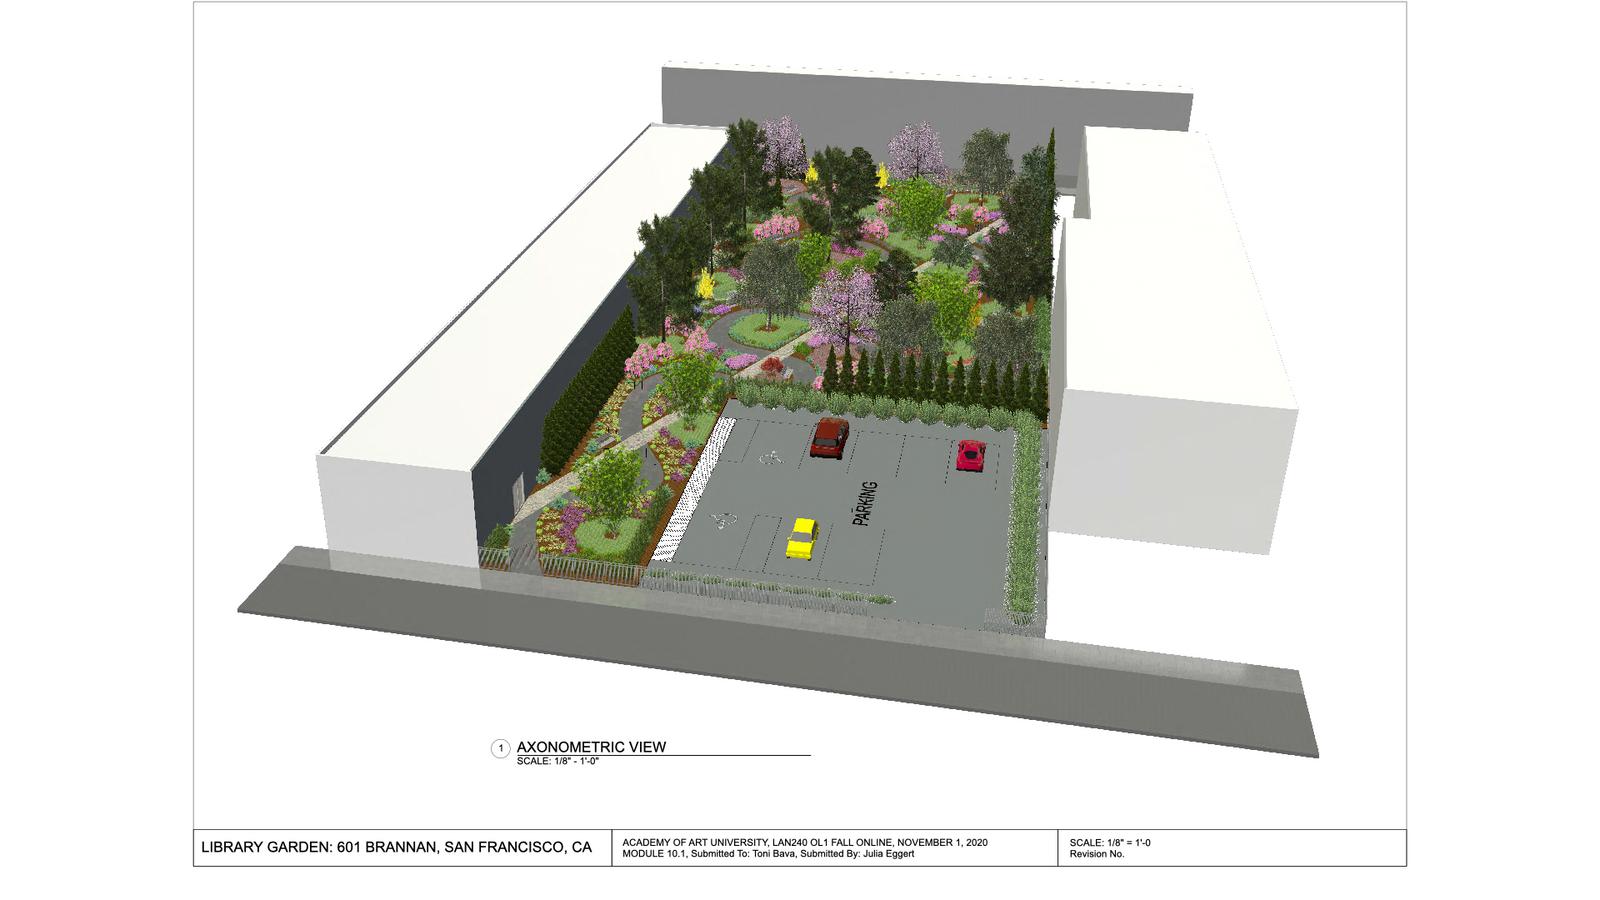 Library Garden for 601 Brannan Street Site 12